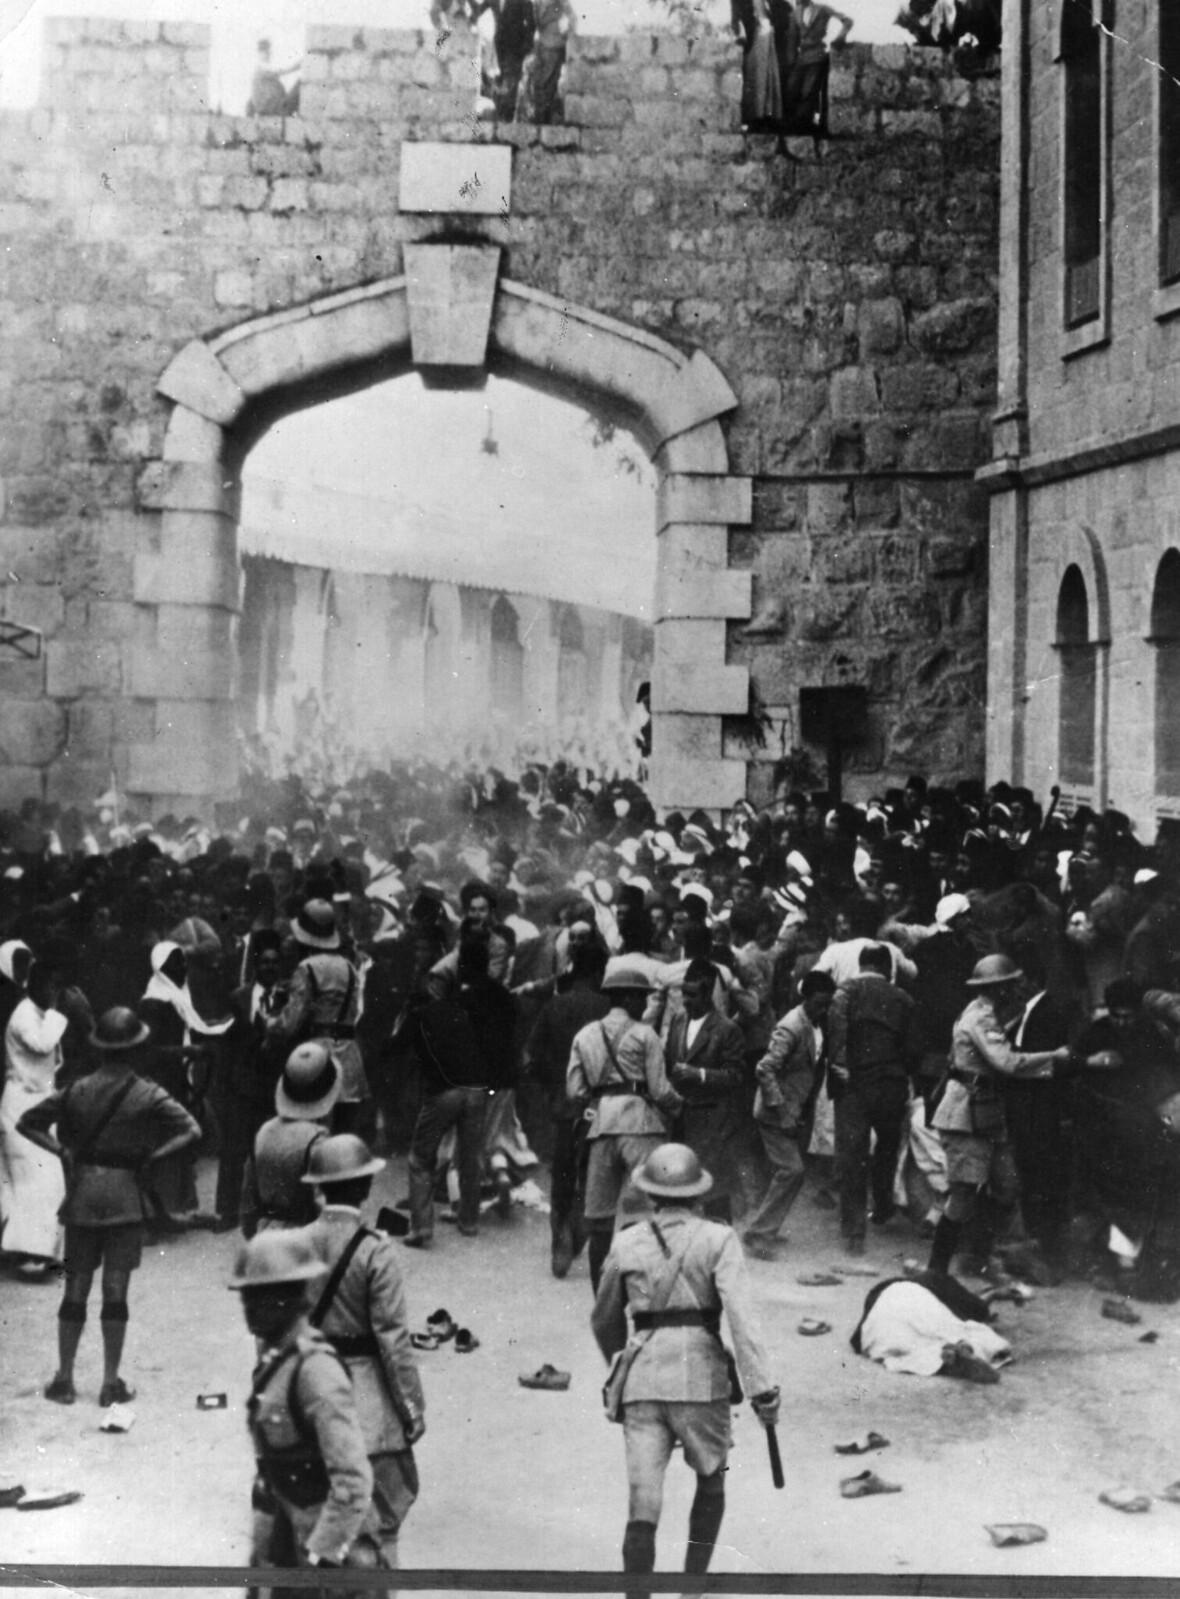 16. 1938. Бунт у Яффских ворот в Иерусалиме